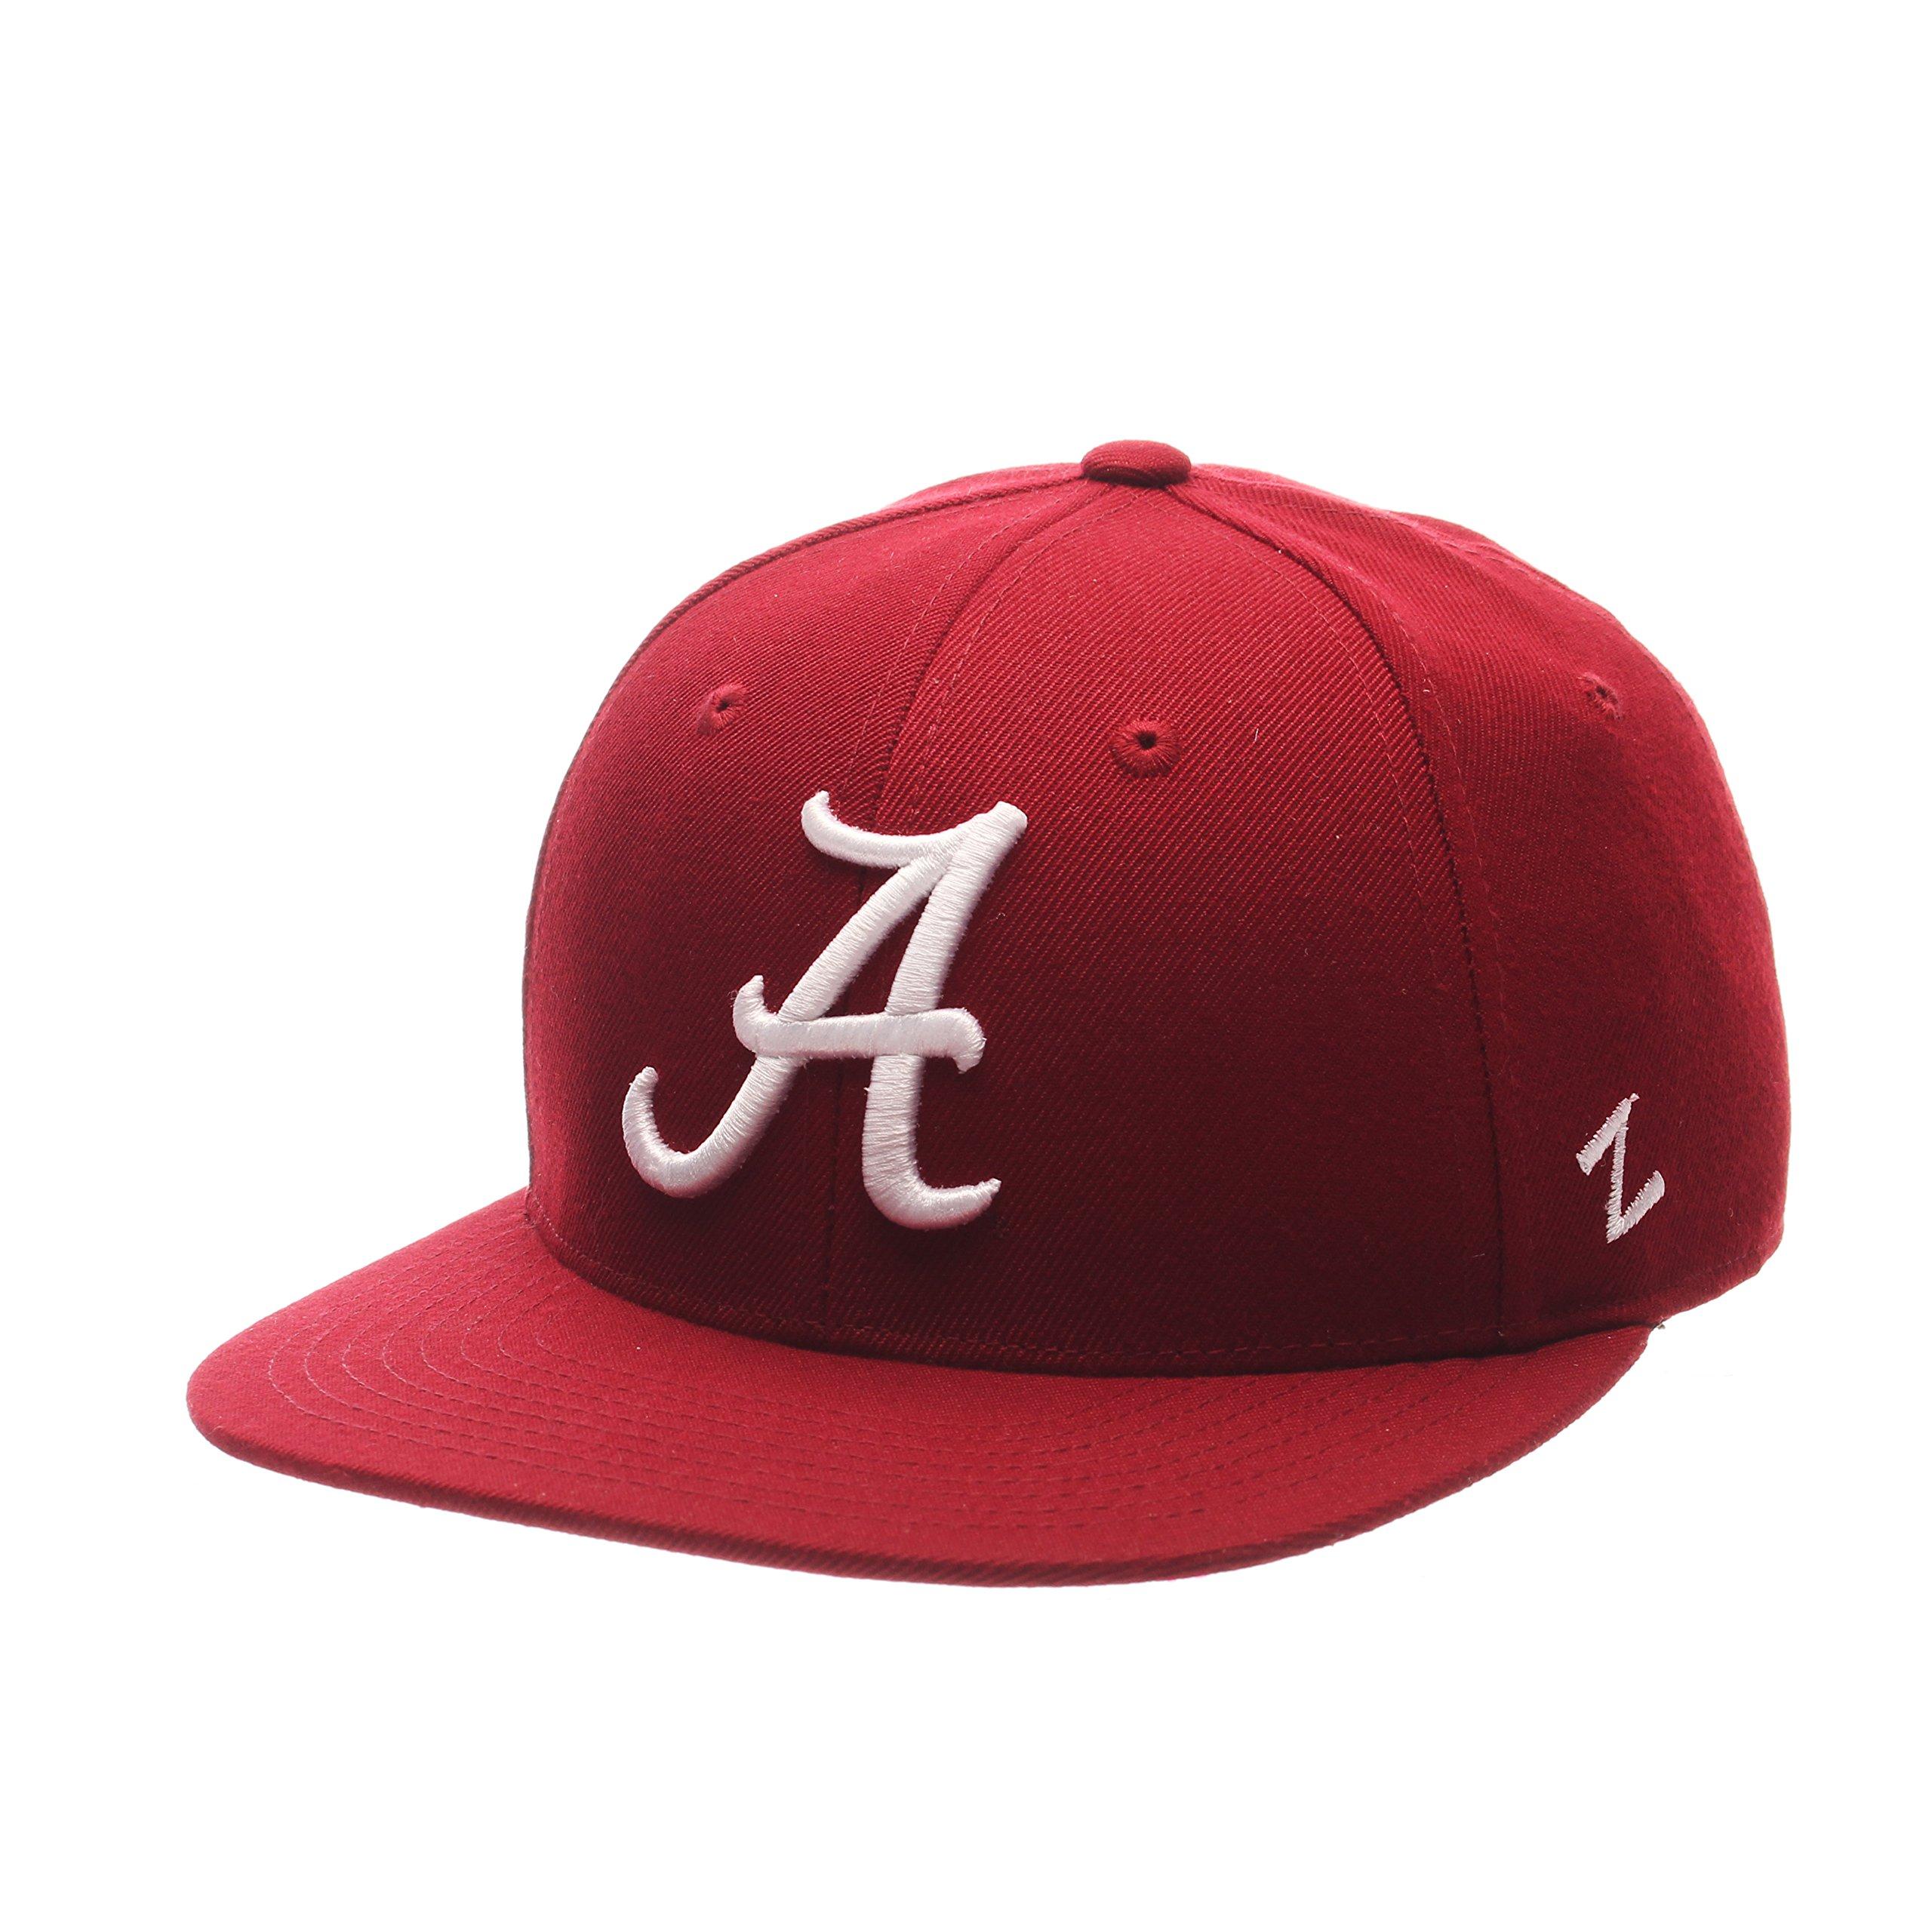 Zephyr NCAA Alabama Crimson Tide Men's M15 Fitted Hat, Cardinal, Size 7